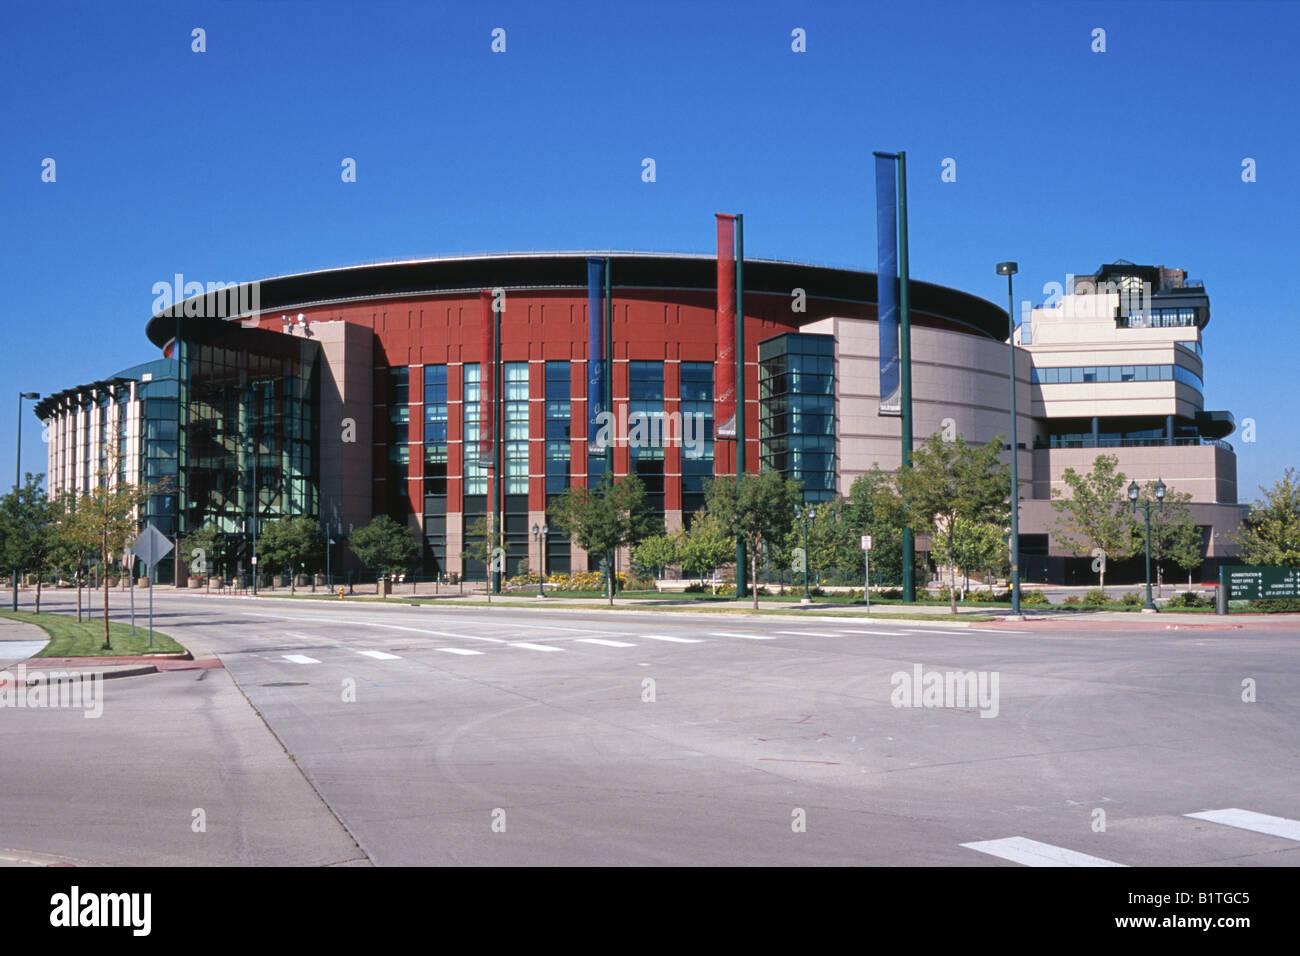 The Pepsi Center sports arena in Denver Colorado USA Stock